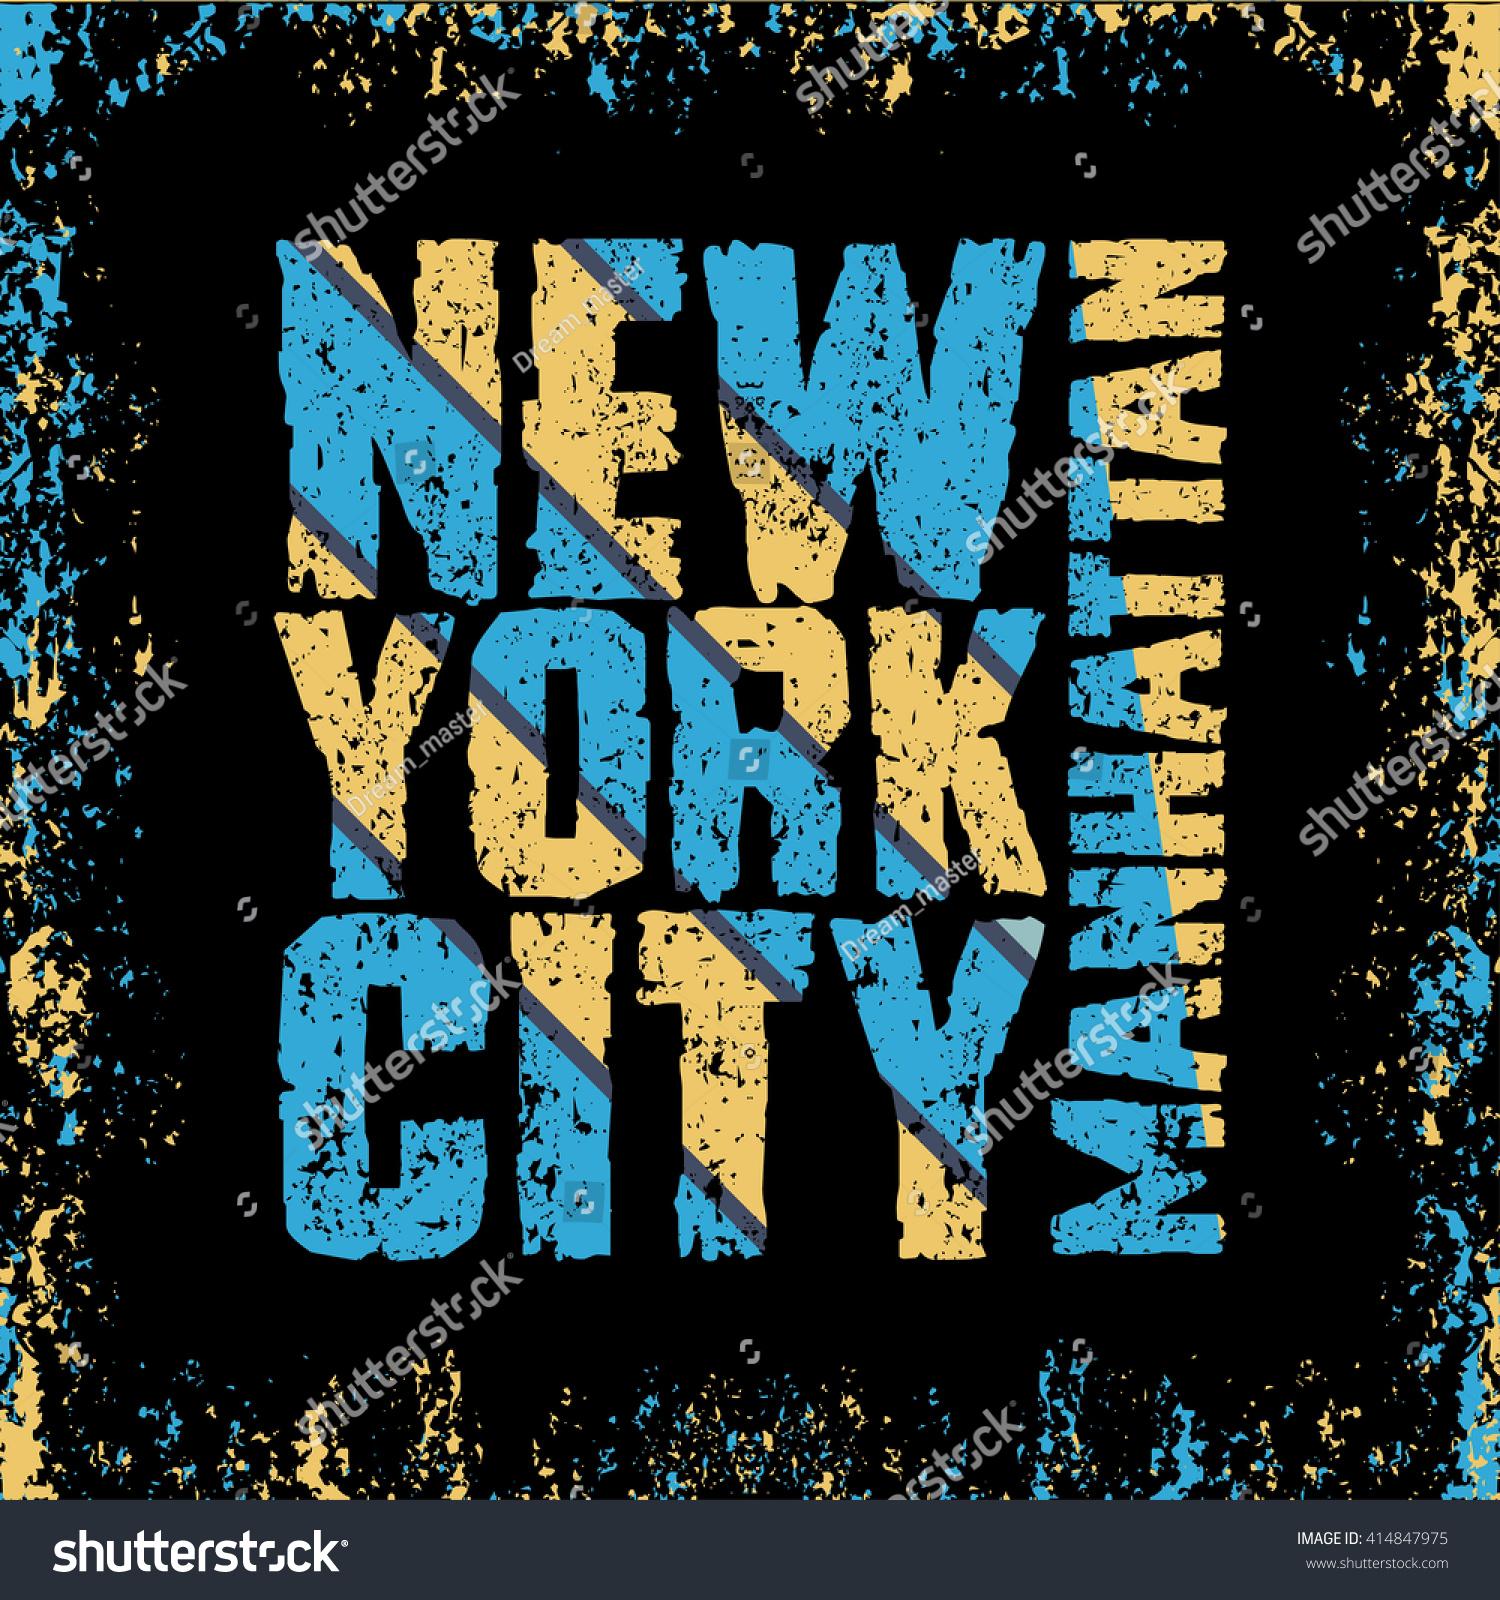 Design a t shirt nyc - New York Typography T Shirt Manhattan Design Graphic Printing Man Nyc